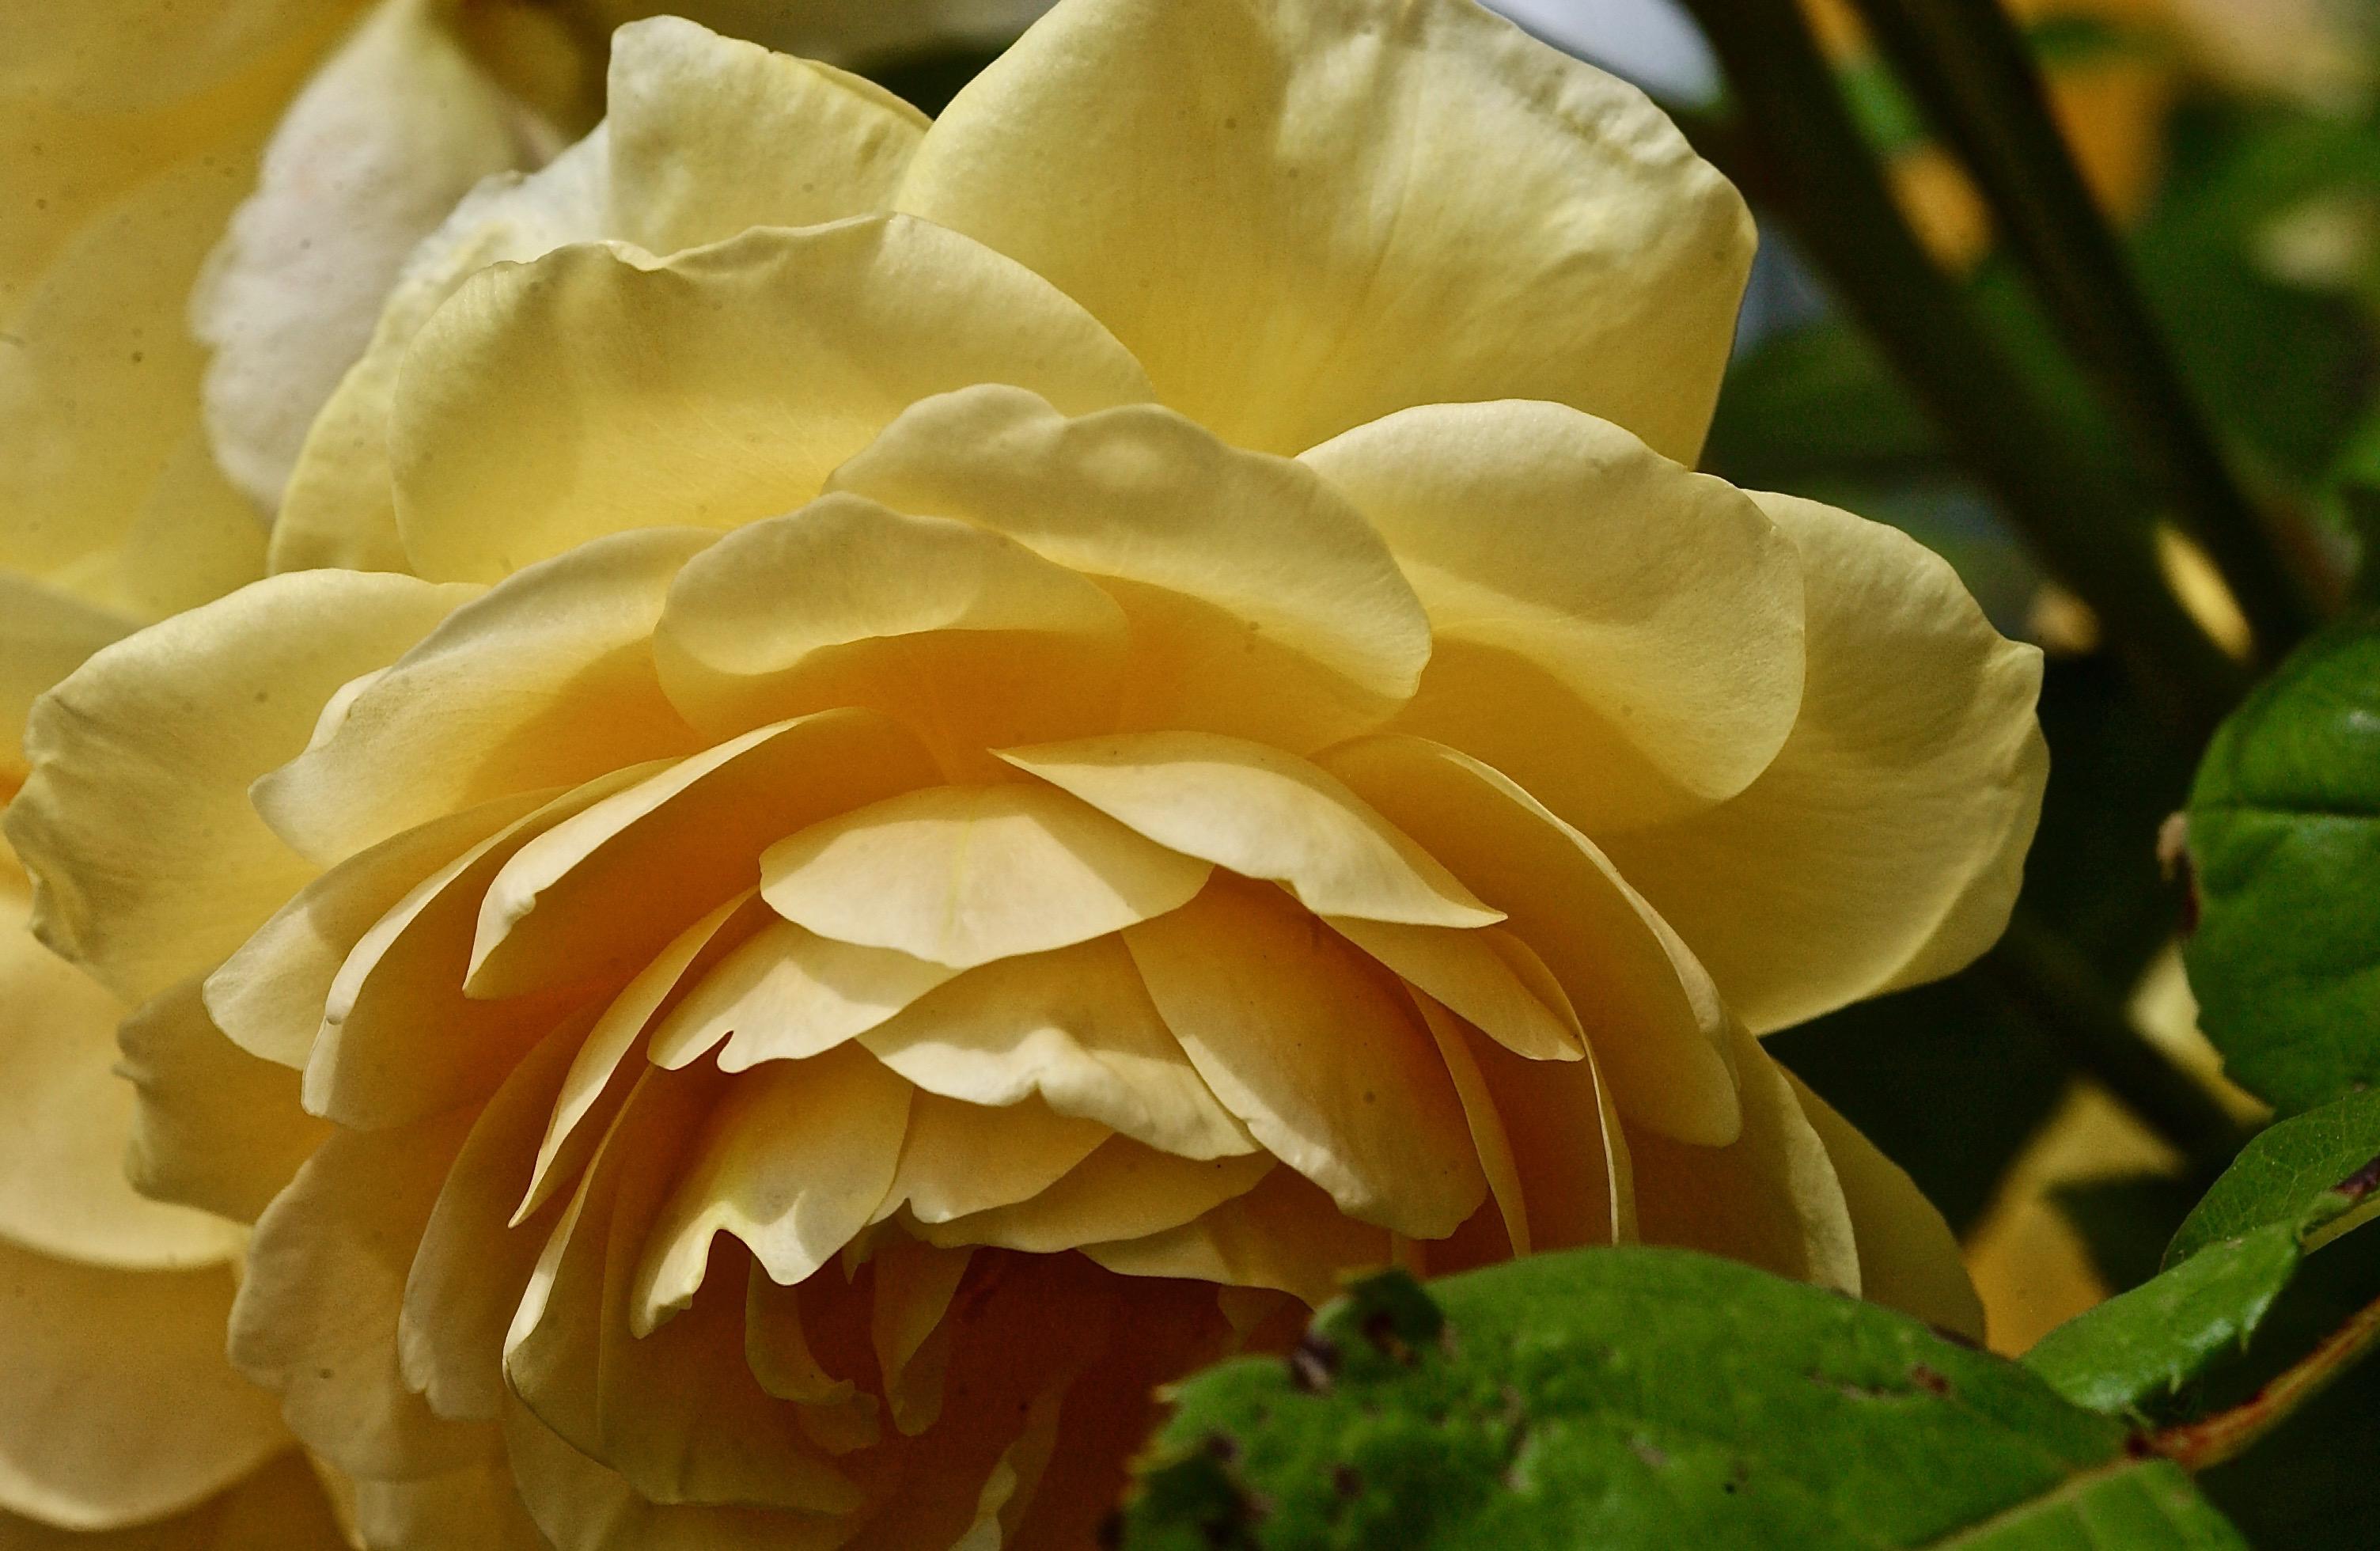 Flower Walk; Edgartown, Martha's Vineyard, Massachusetts, USA